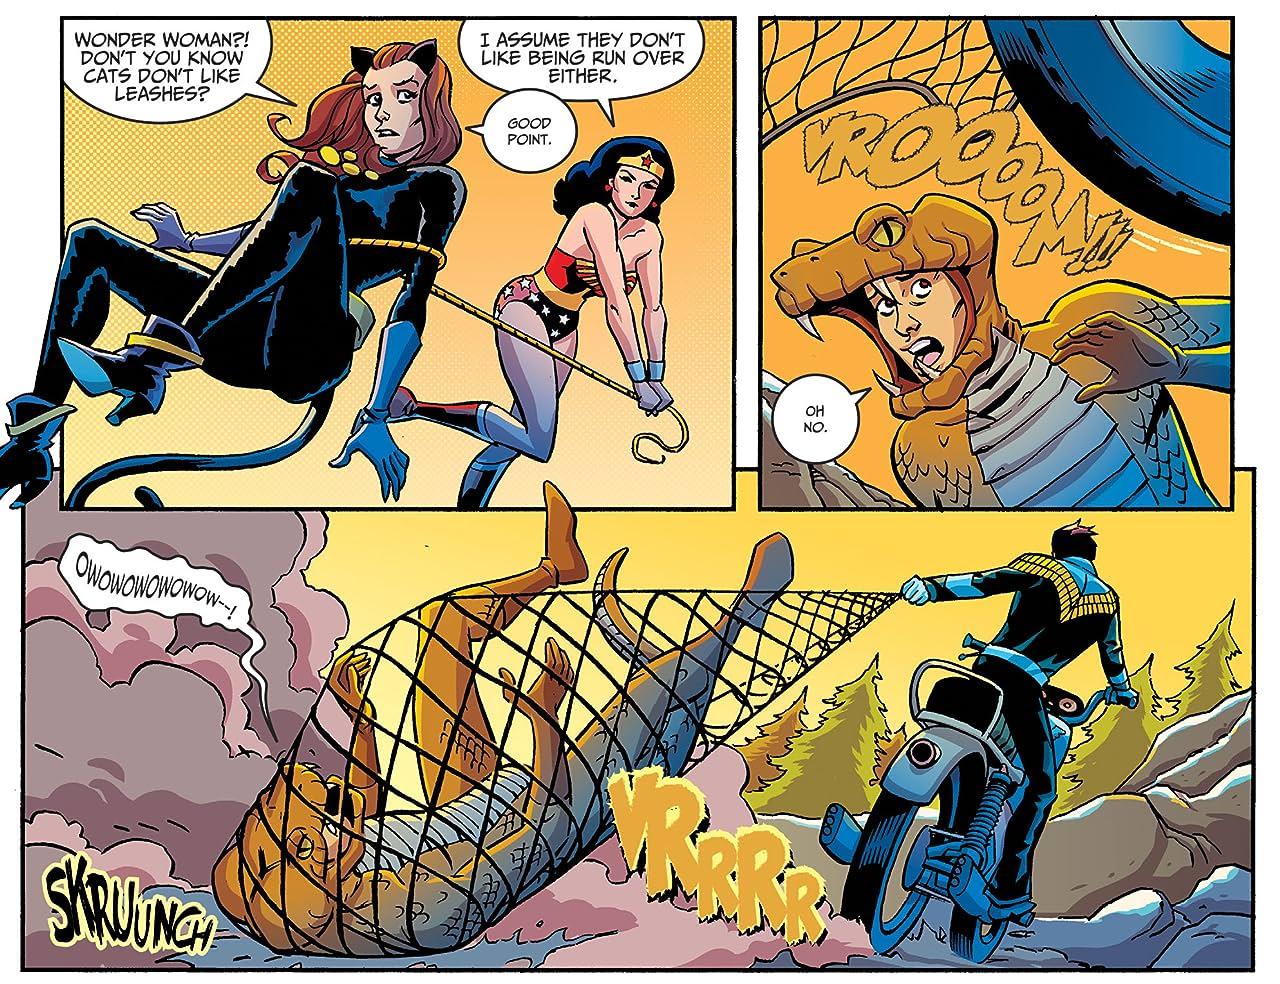 Batman '66 Meets Wonder Woman '77 (2016-2017) #10